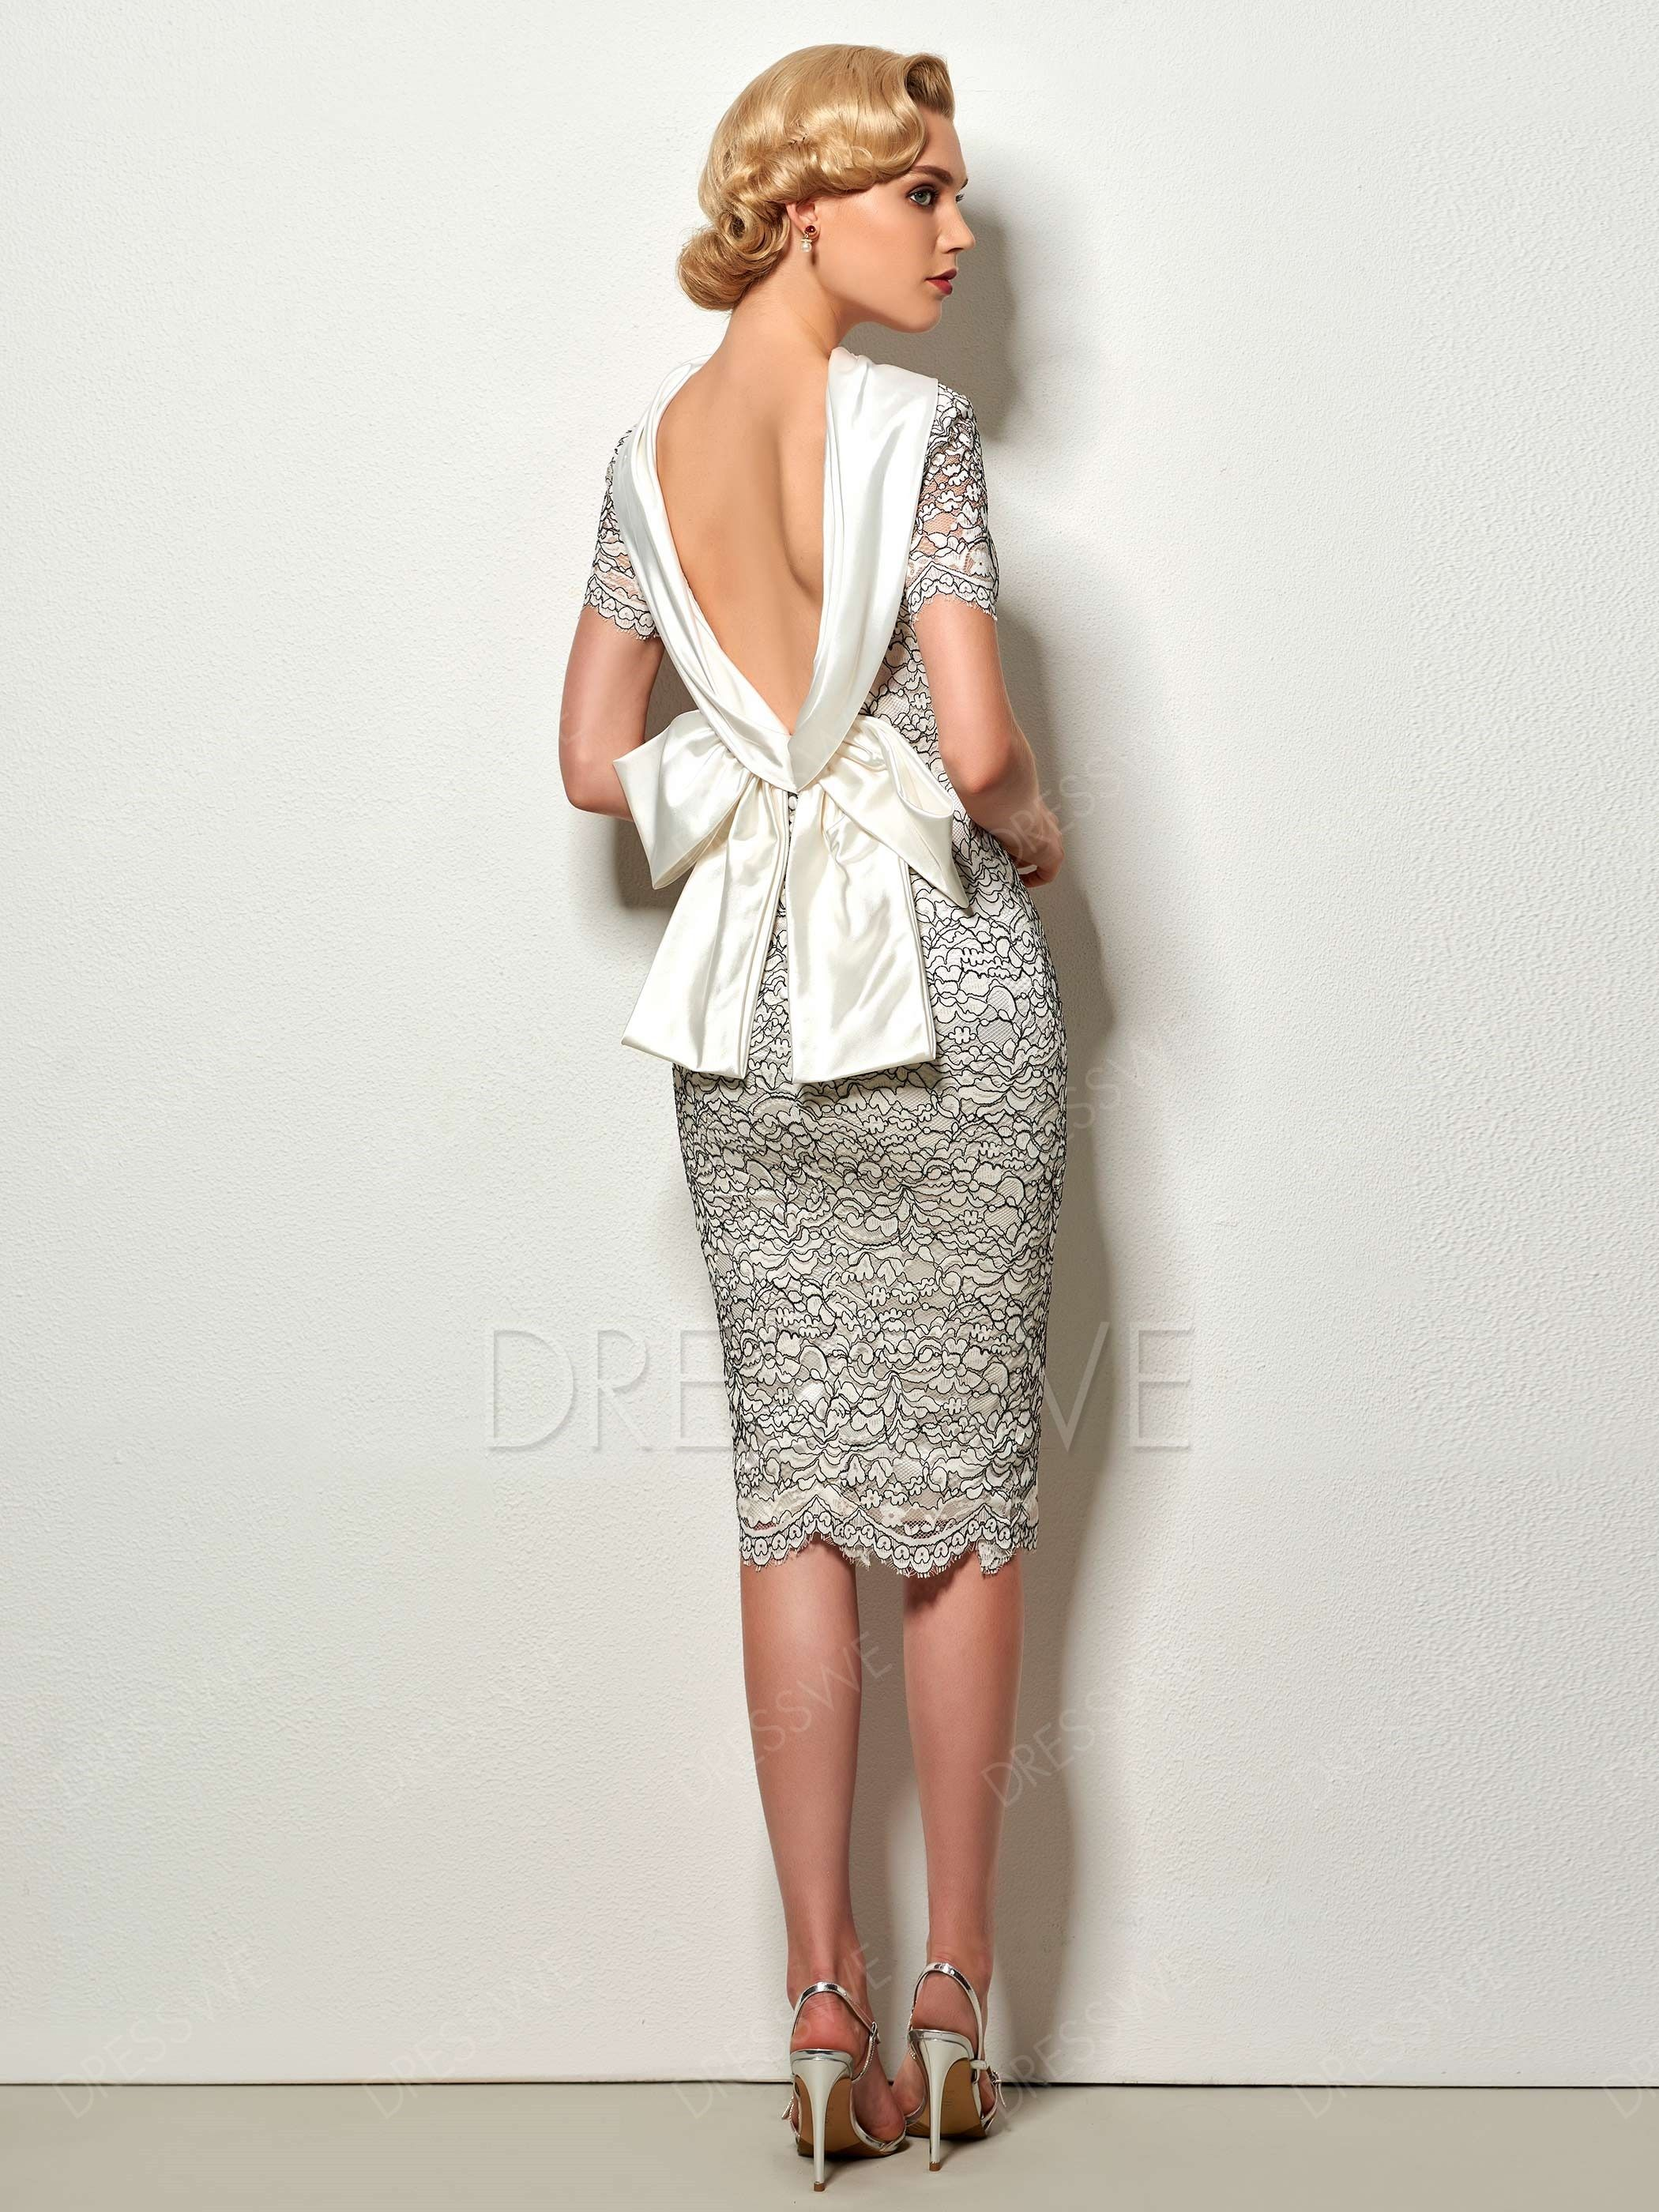 0ac0520f4a8 Dresswe.com SUPPLIES Vintage Sheath Short Sleeve Deep Back Knee Length  Cocktail Dress Cocktail Dresses 2017 (2)